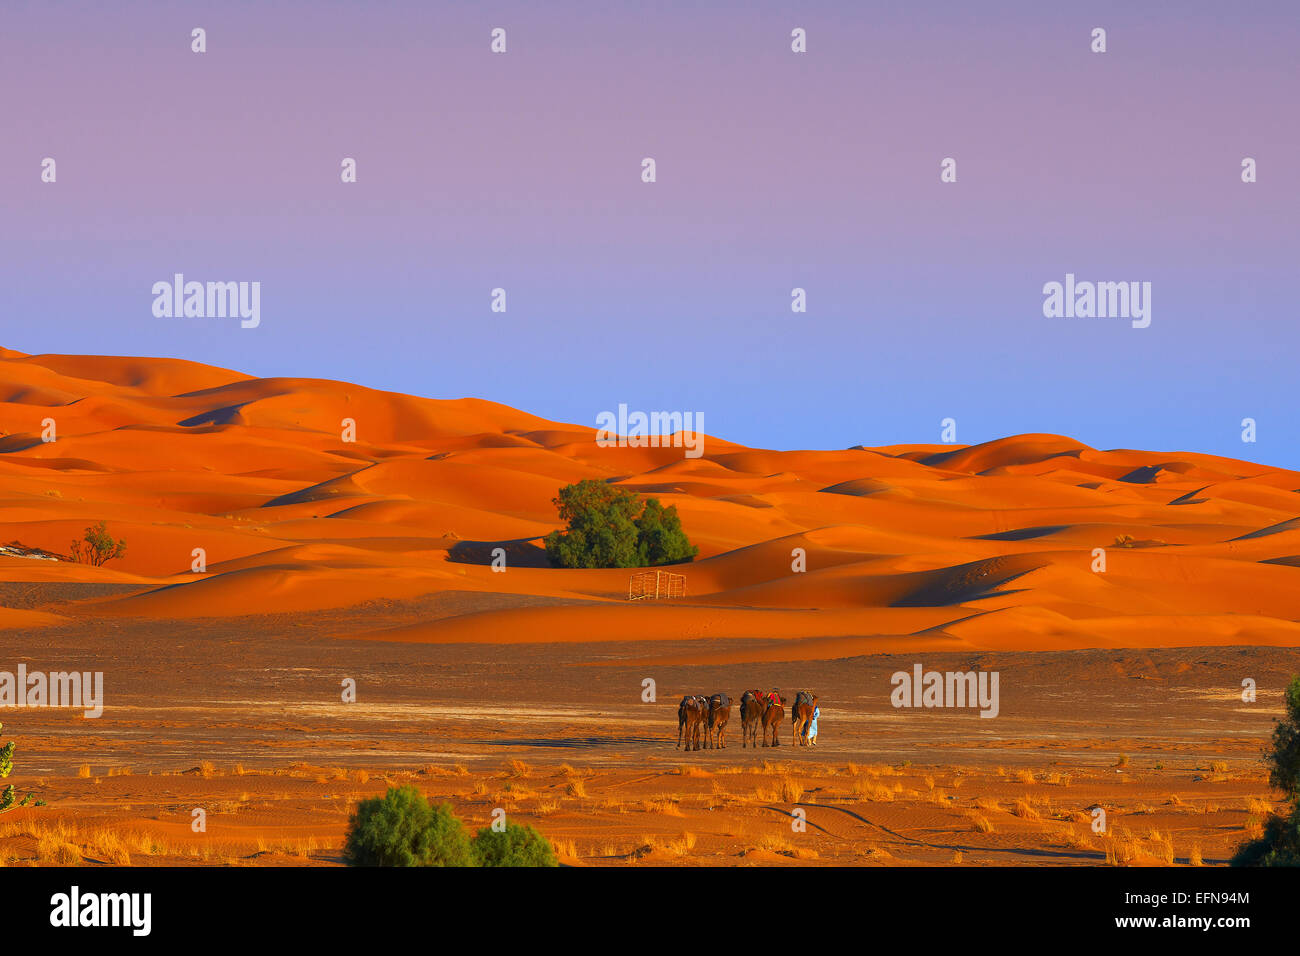 Merzouga, Erg Chebbi, Camel trekking, Merzouga sand dunes, Sahara Desert, Morocco, Maghreb, North Africa. - Stock Image